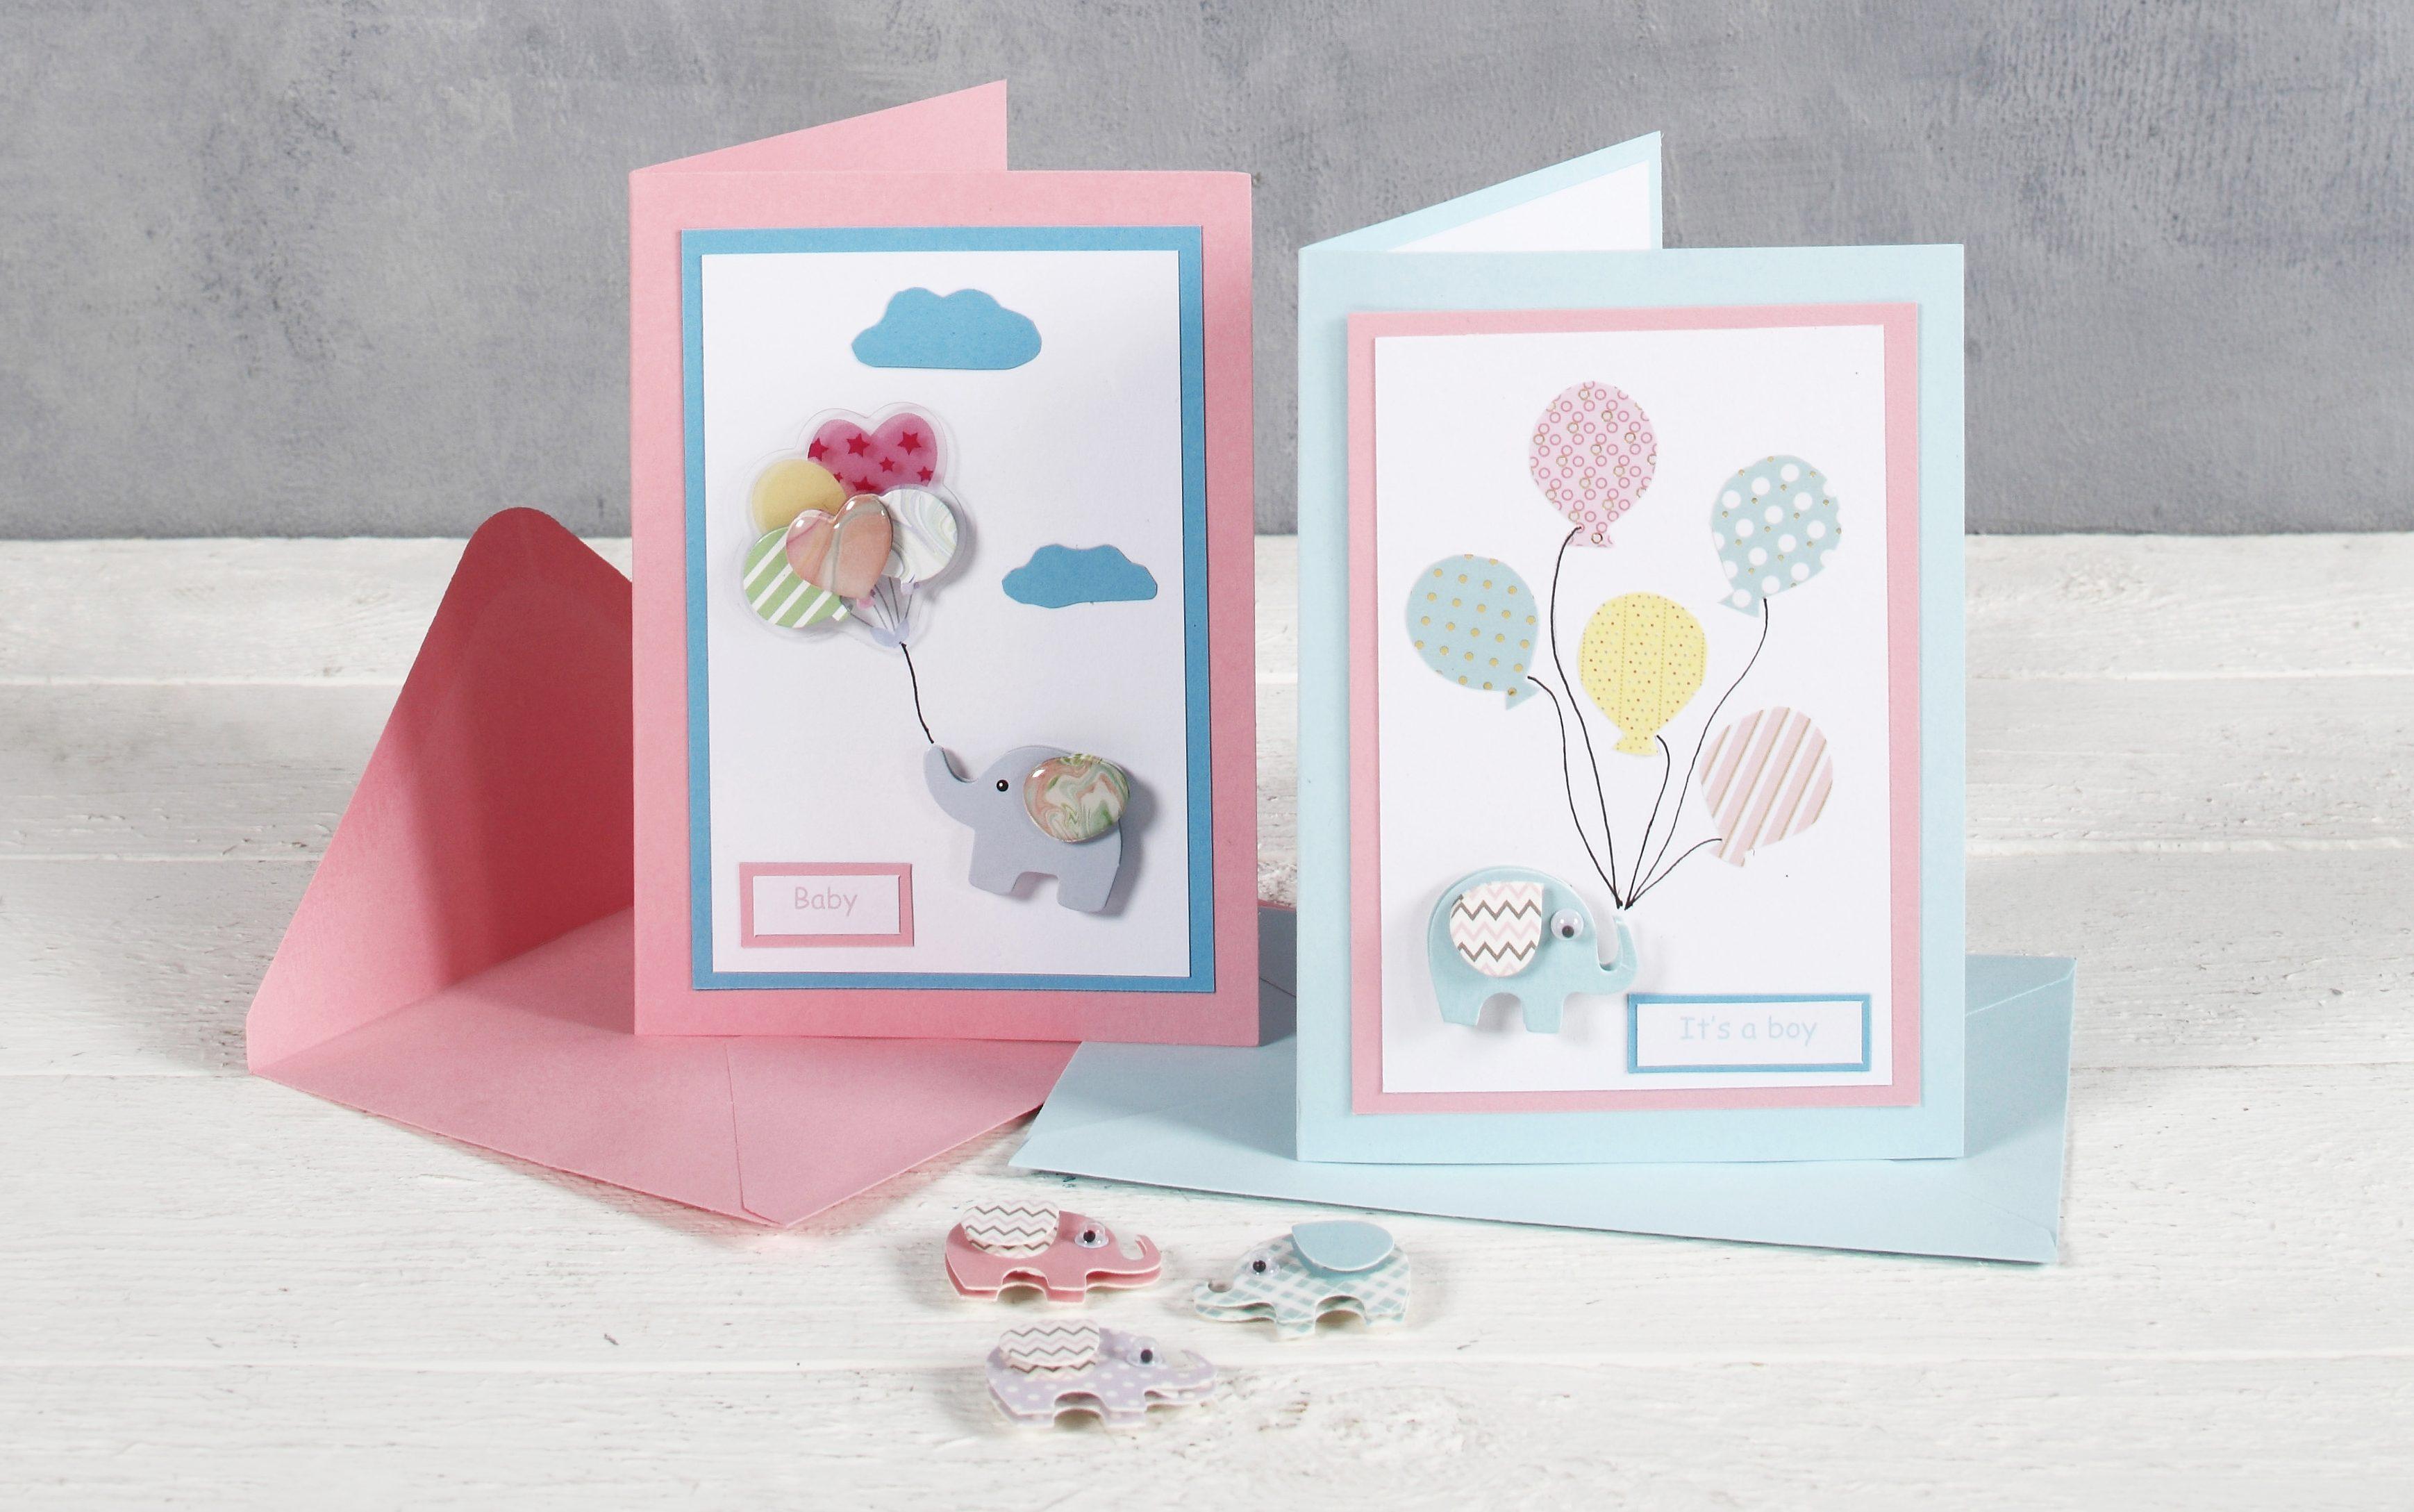 Babyshower kort med elefant och ballong